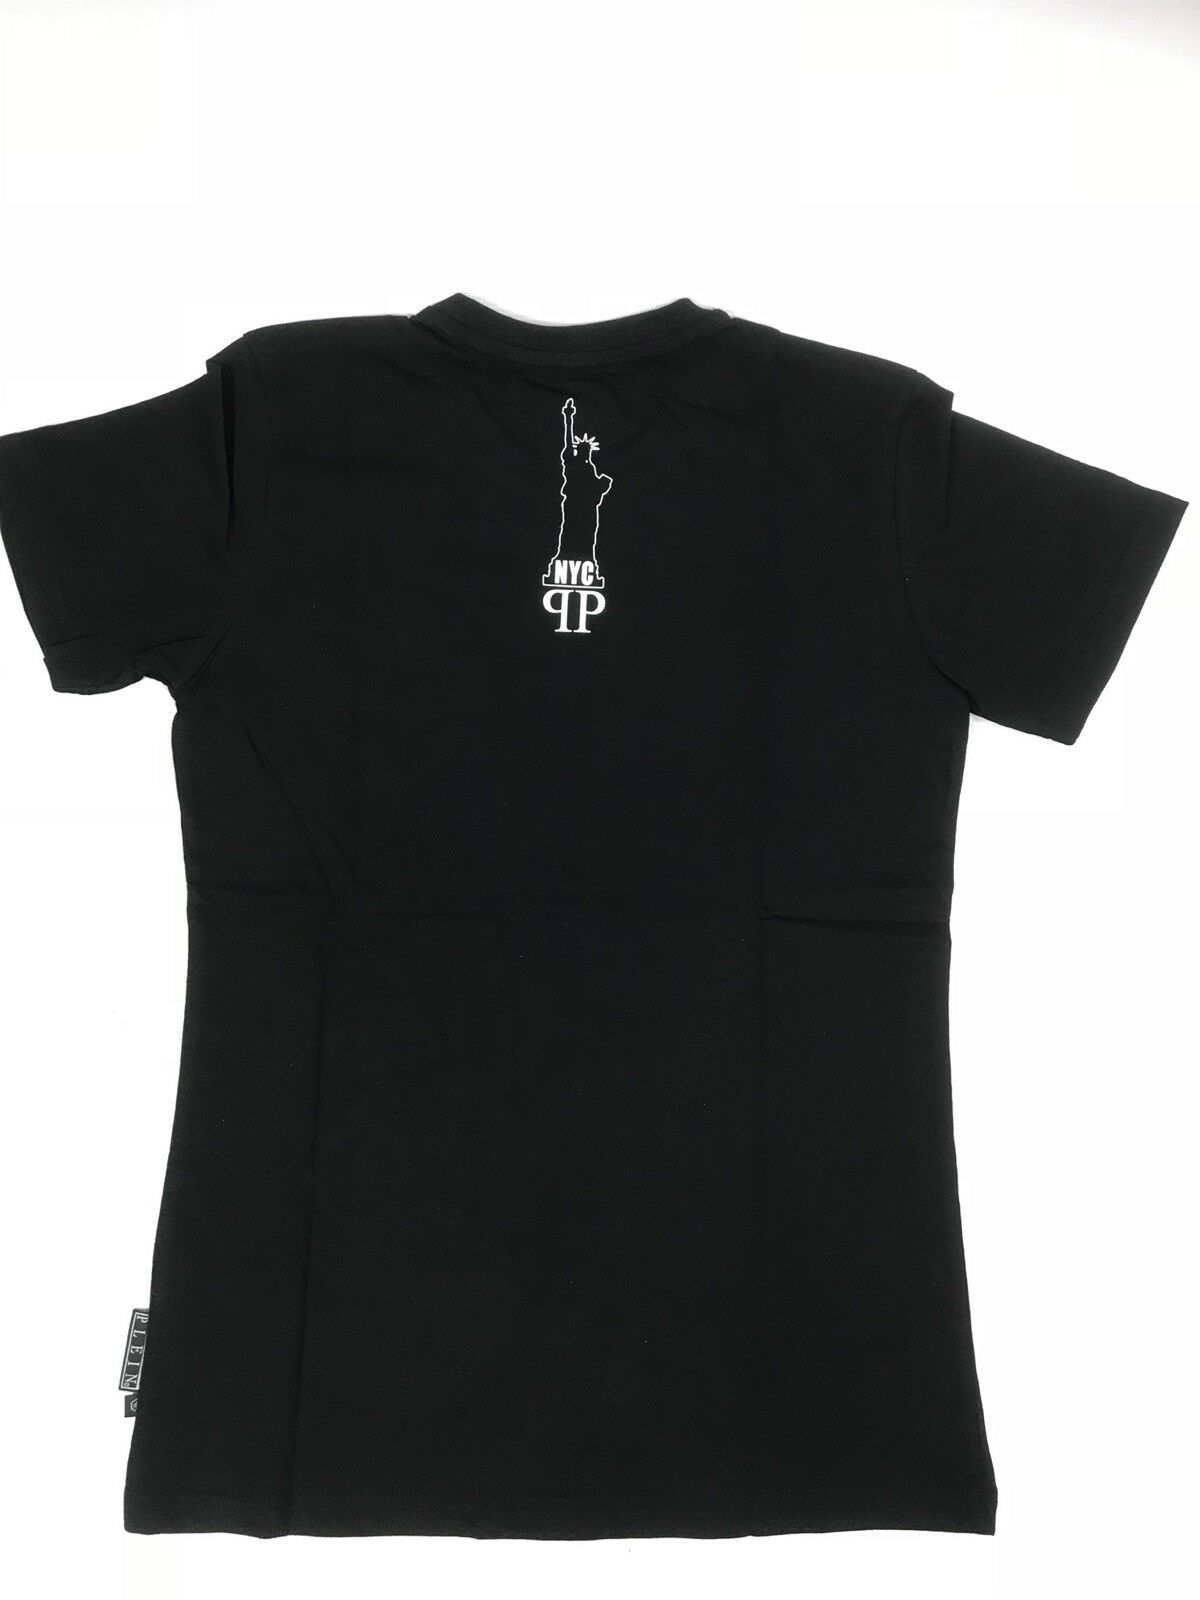 Philipp S PLEIN T-shirt grande girocollo TWINS NERO TG S Philipp 772083